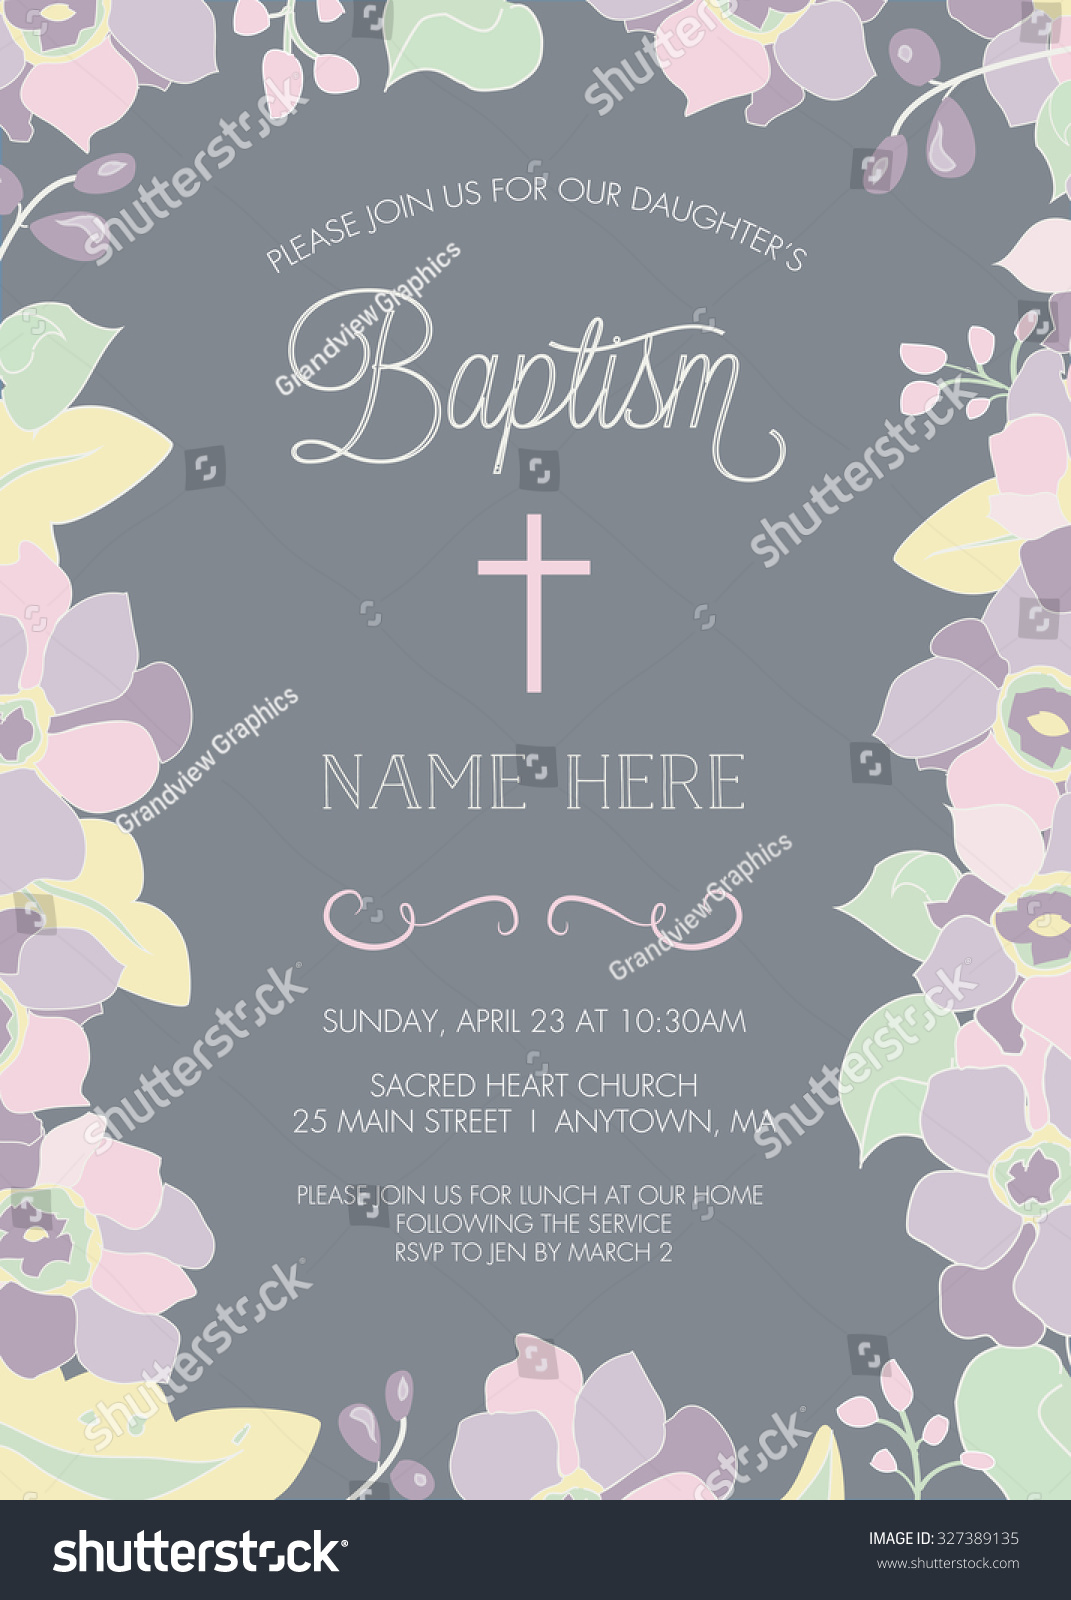 Baptism Invitations Vector Free